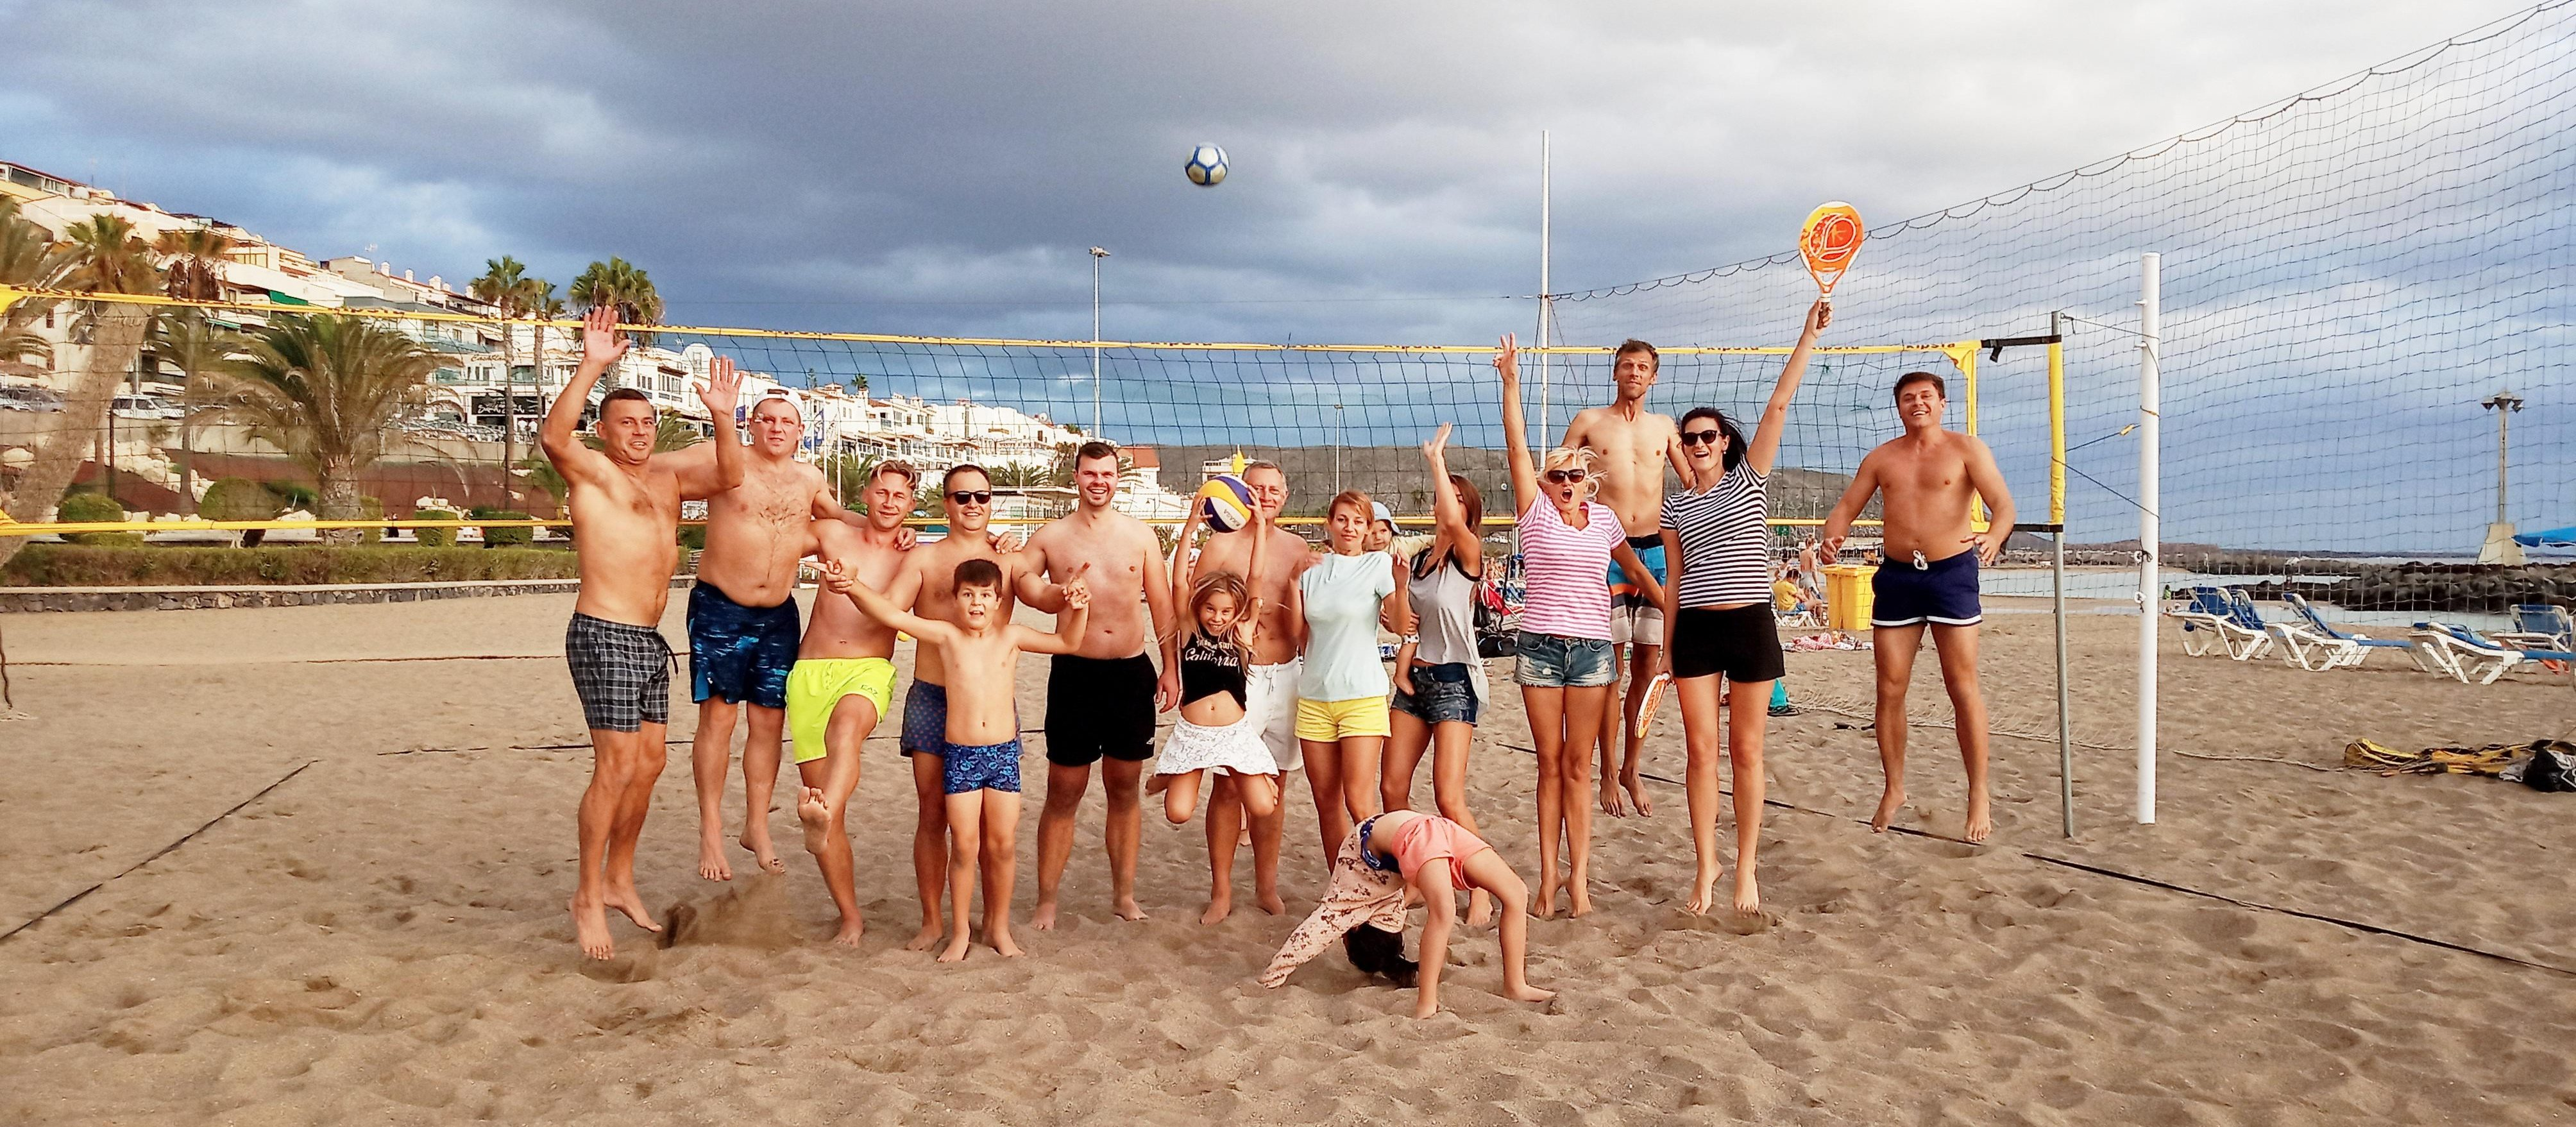 Tinklinis Playa Torvisca, Costa Adeje paplūdimyje